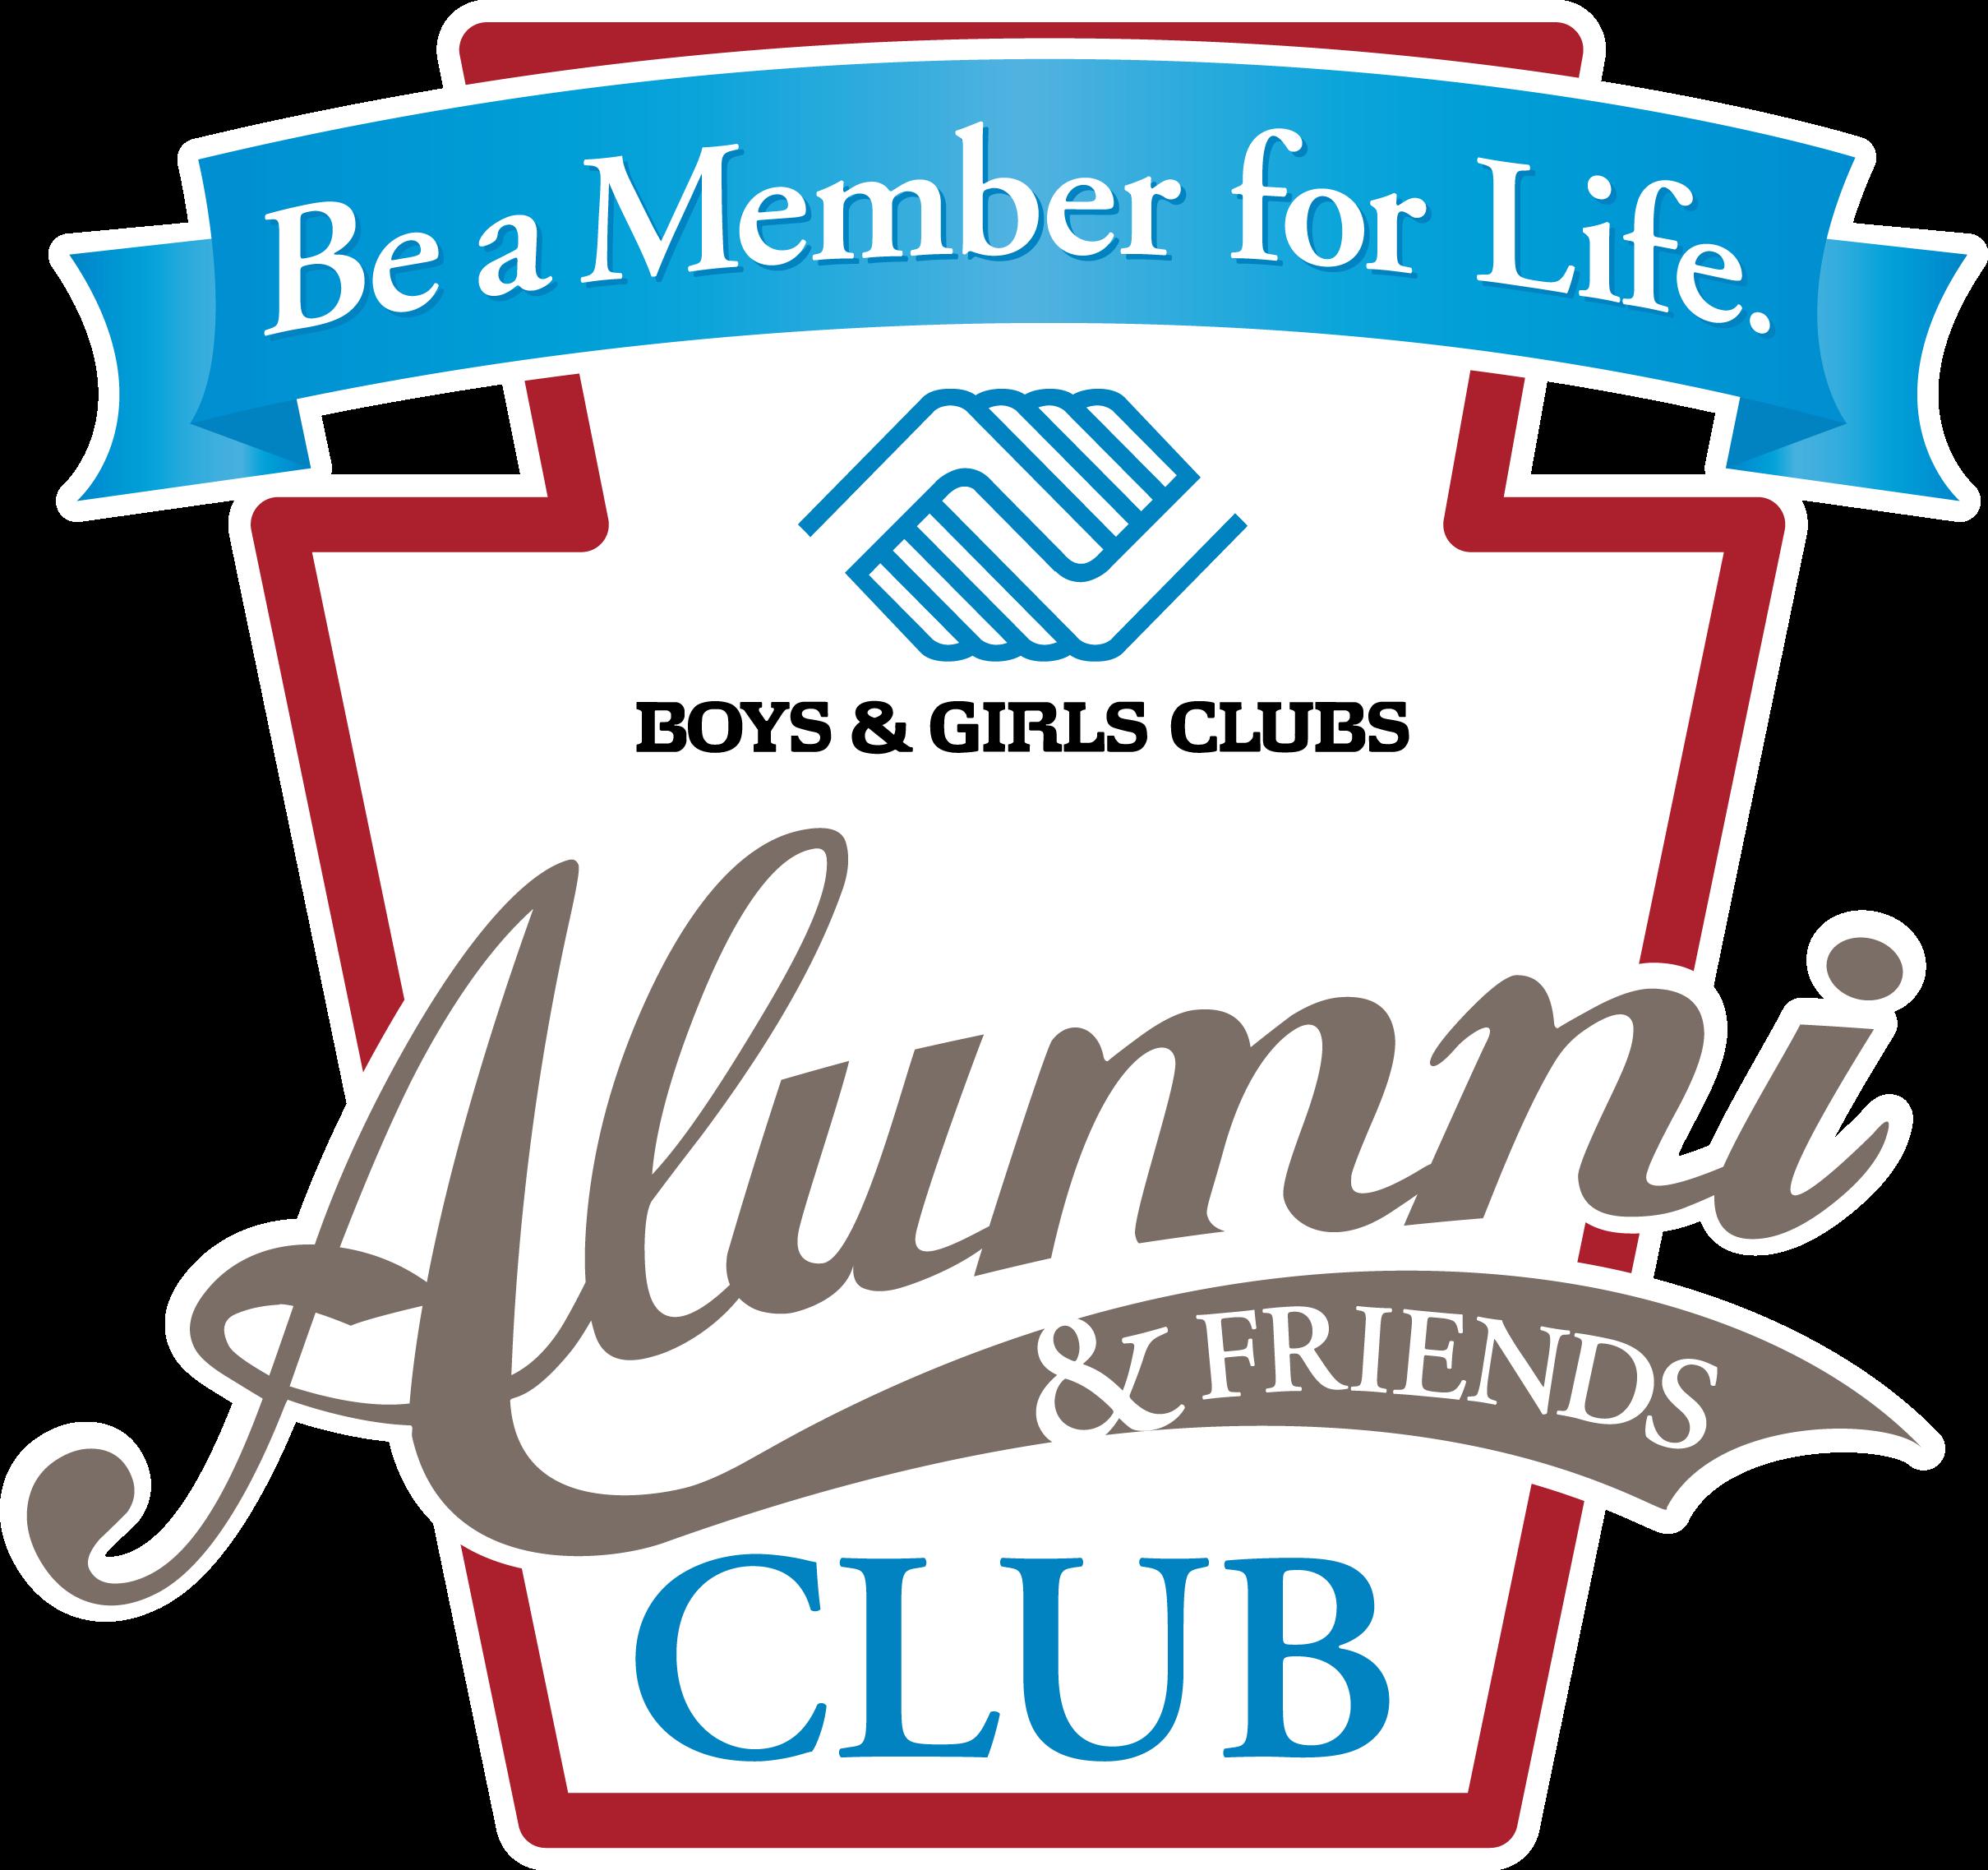 ALUMNI and FRIENDS_CLR